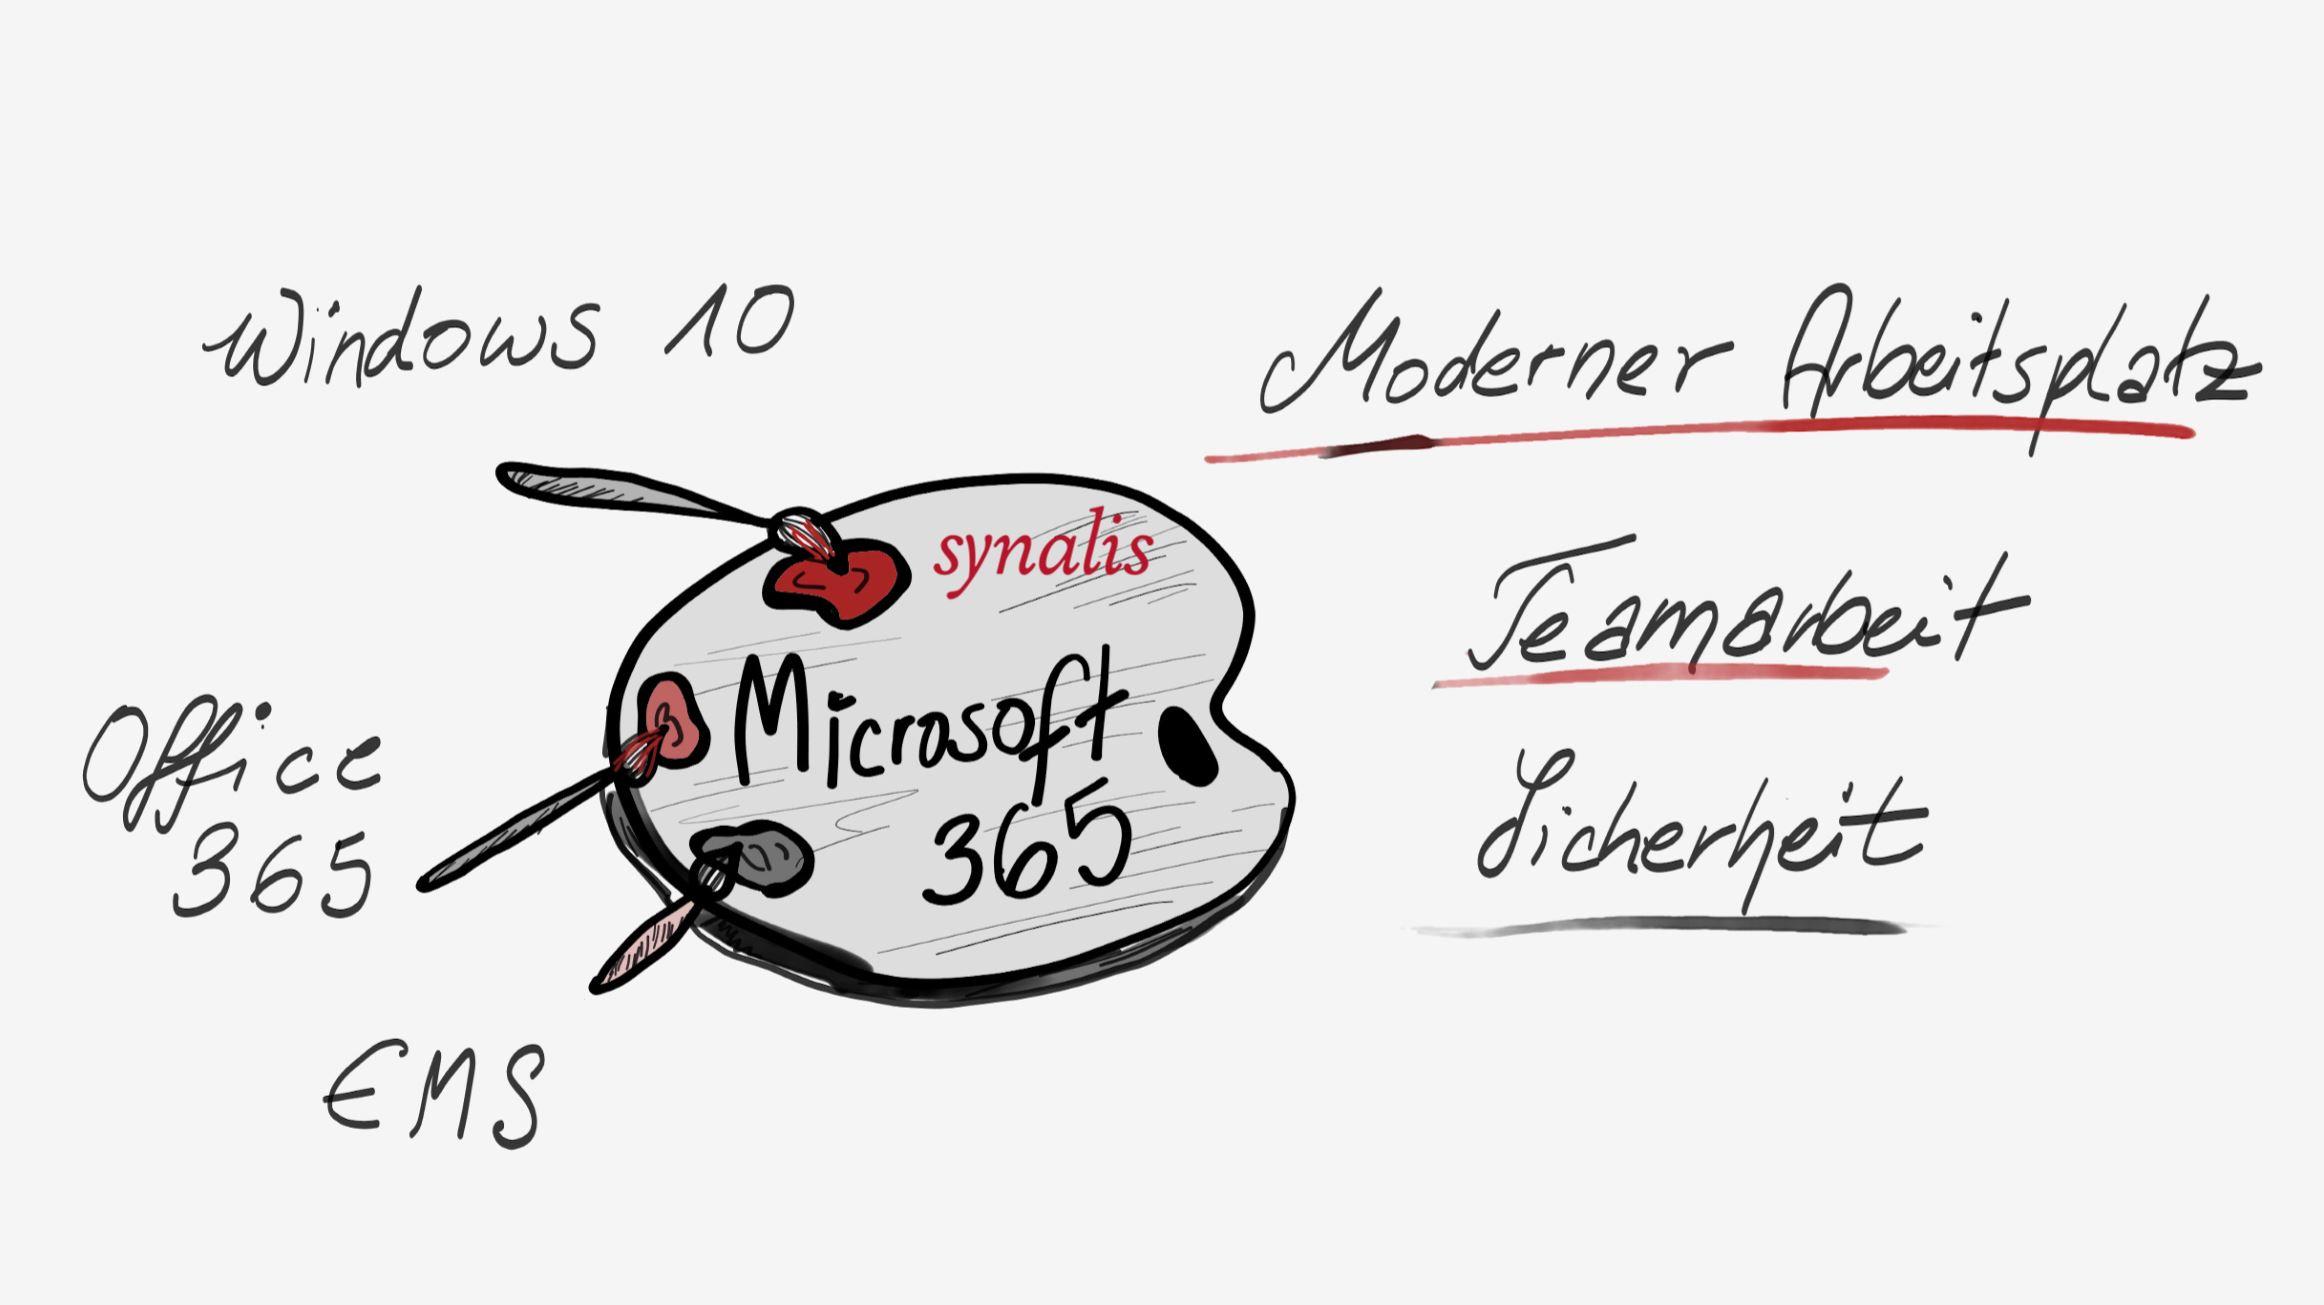 Vorteile Microsoft 365 synalis IT